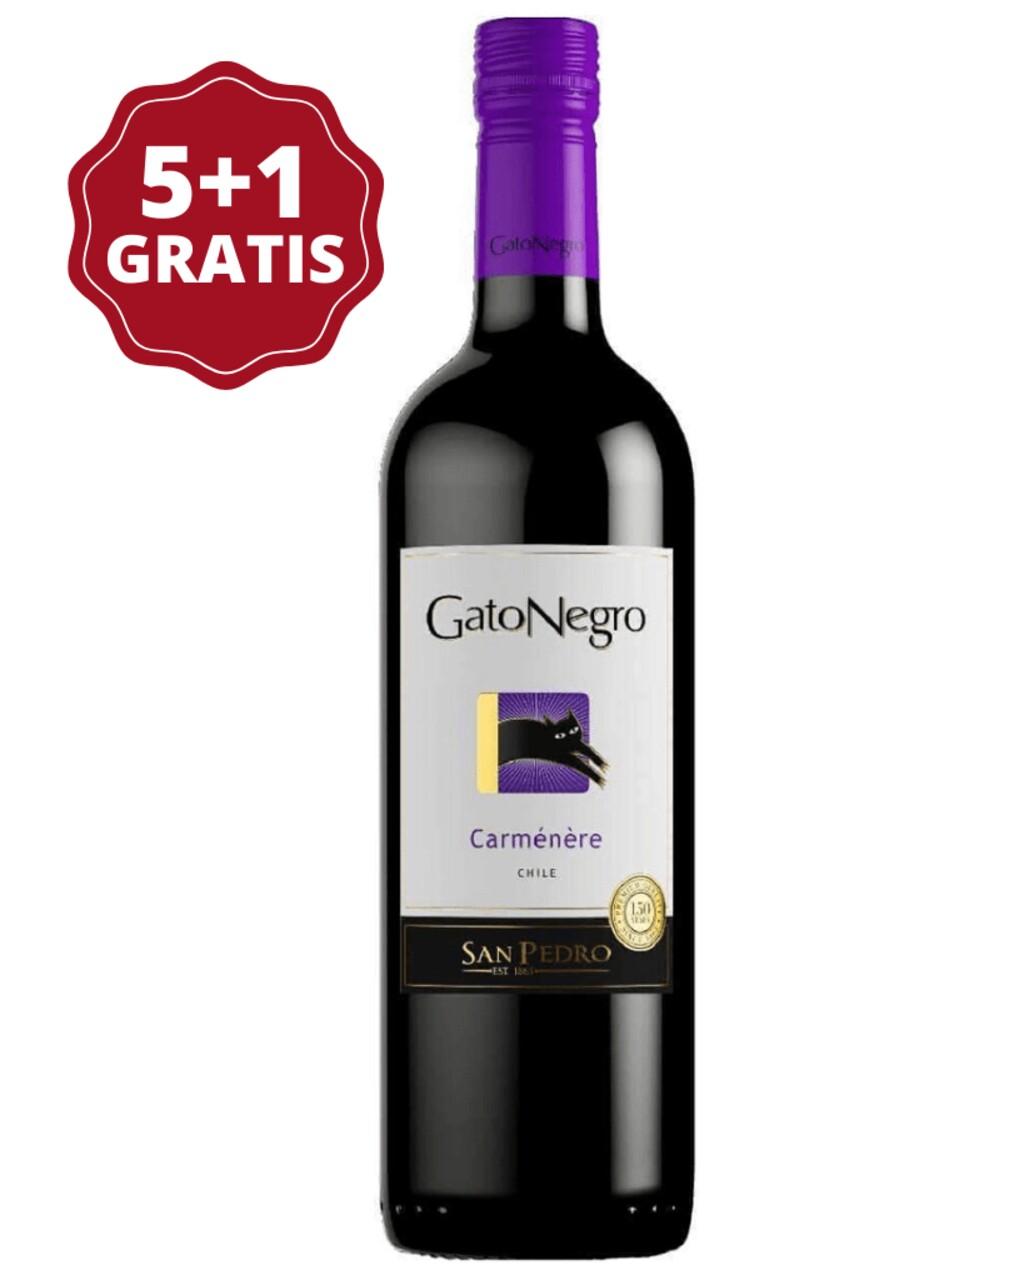 San Pedro Gato Negro Carmenere 5+1